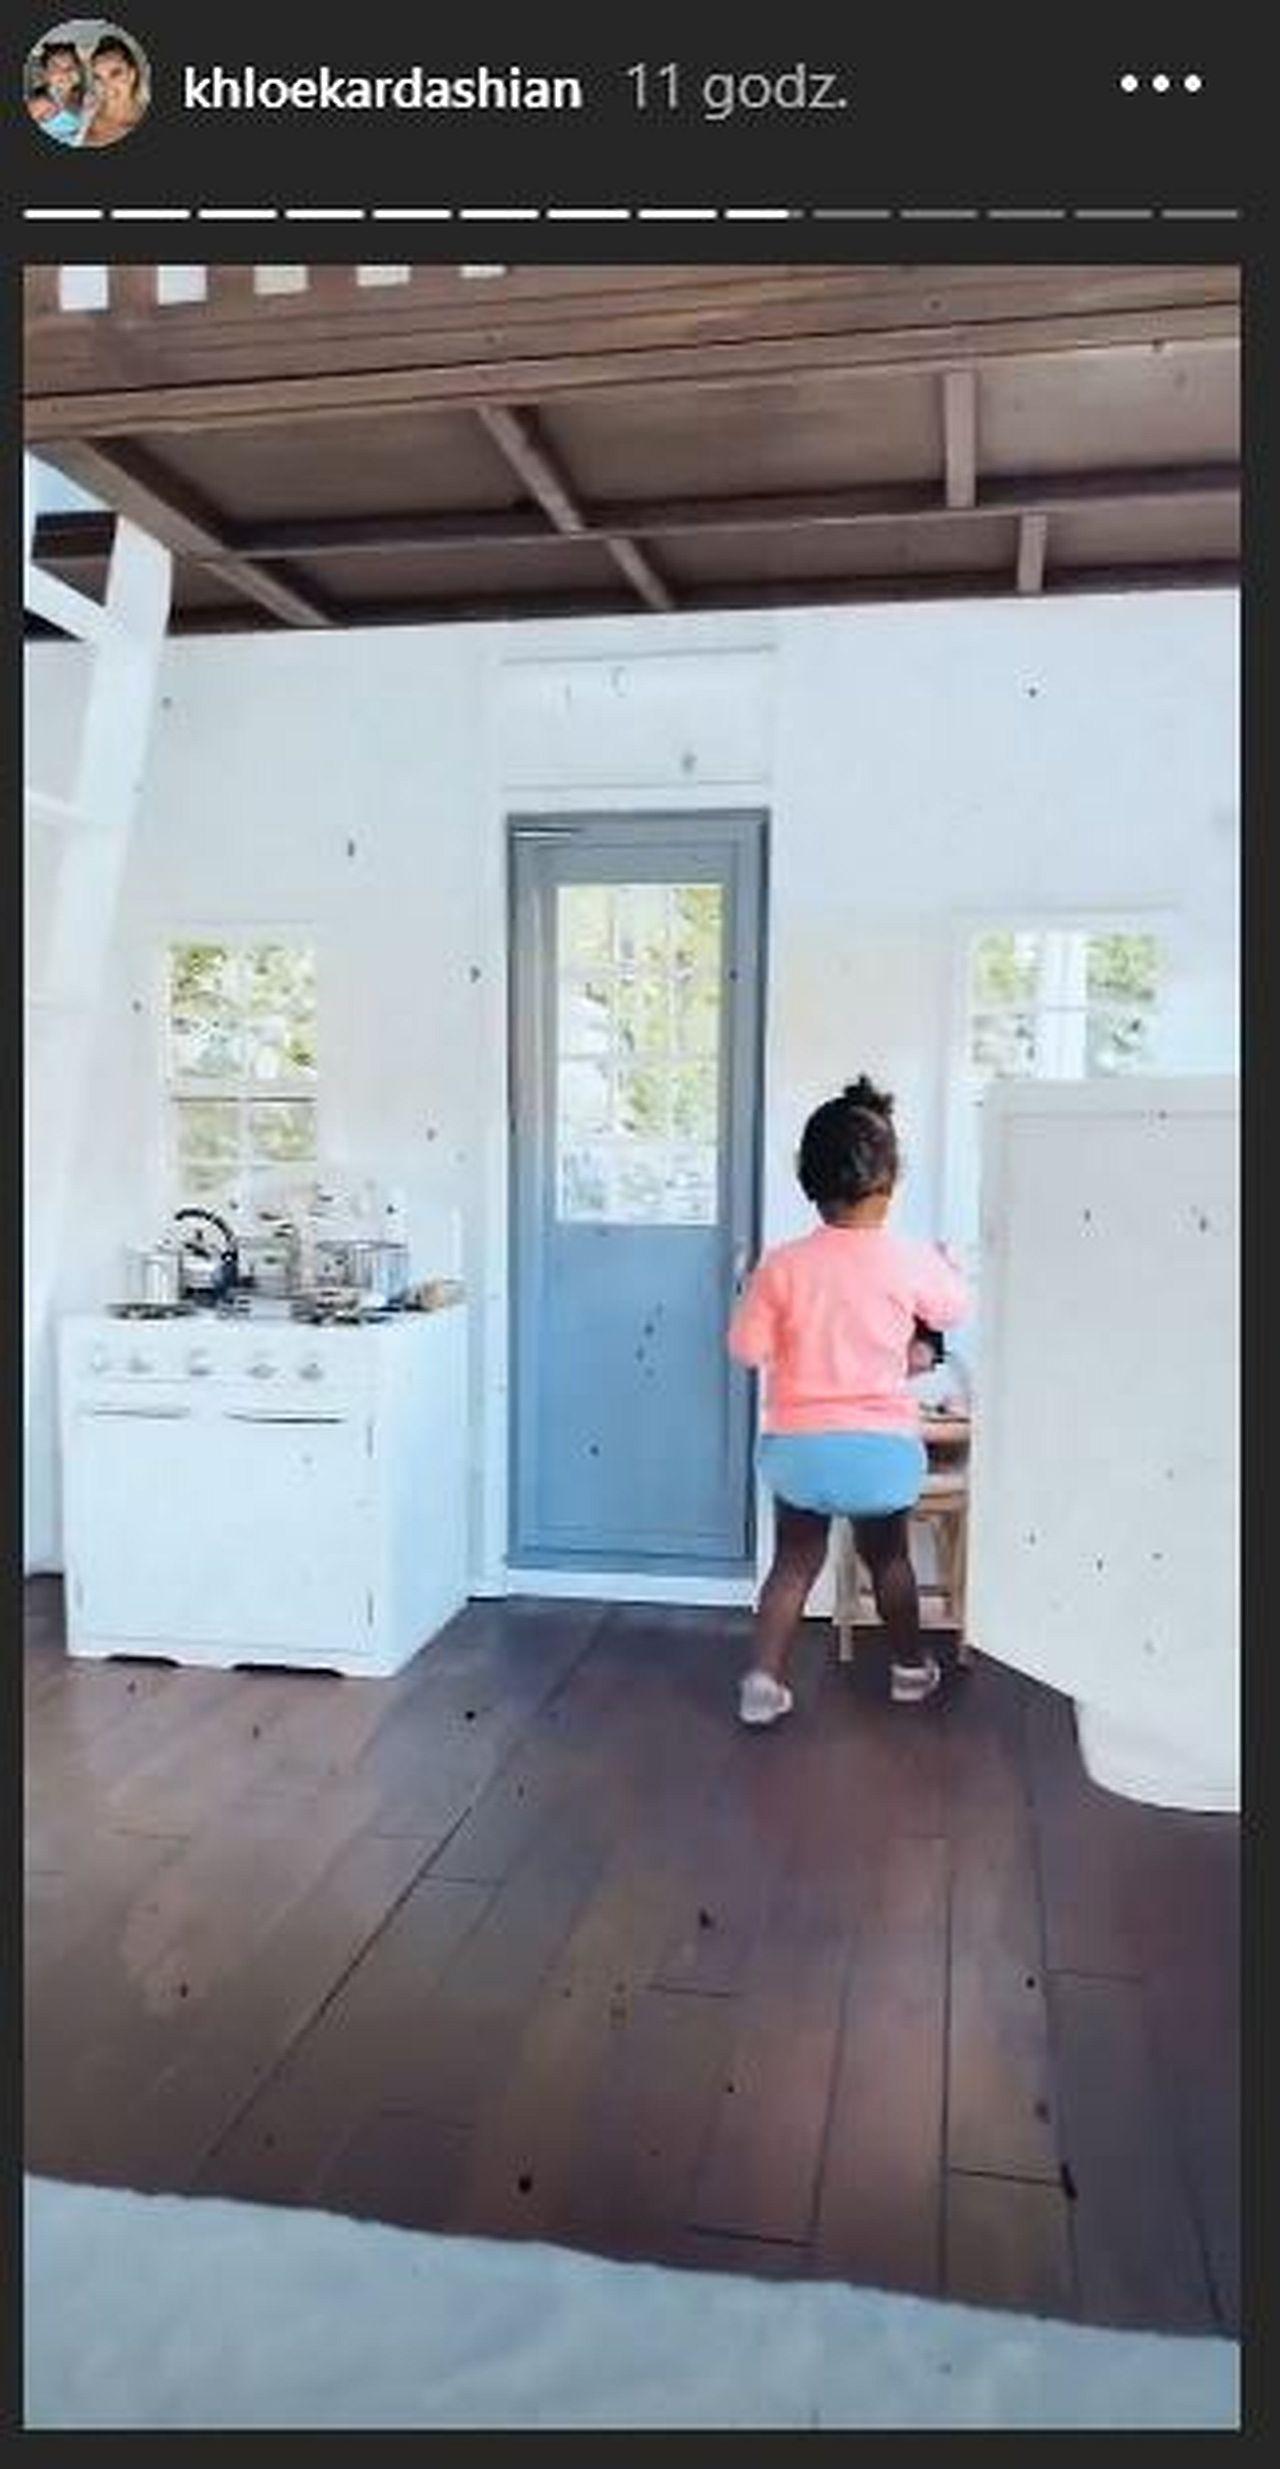 Córka Khloe Kardashian w swoim domku